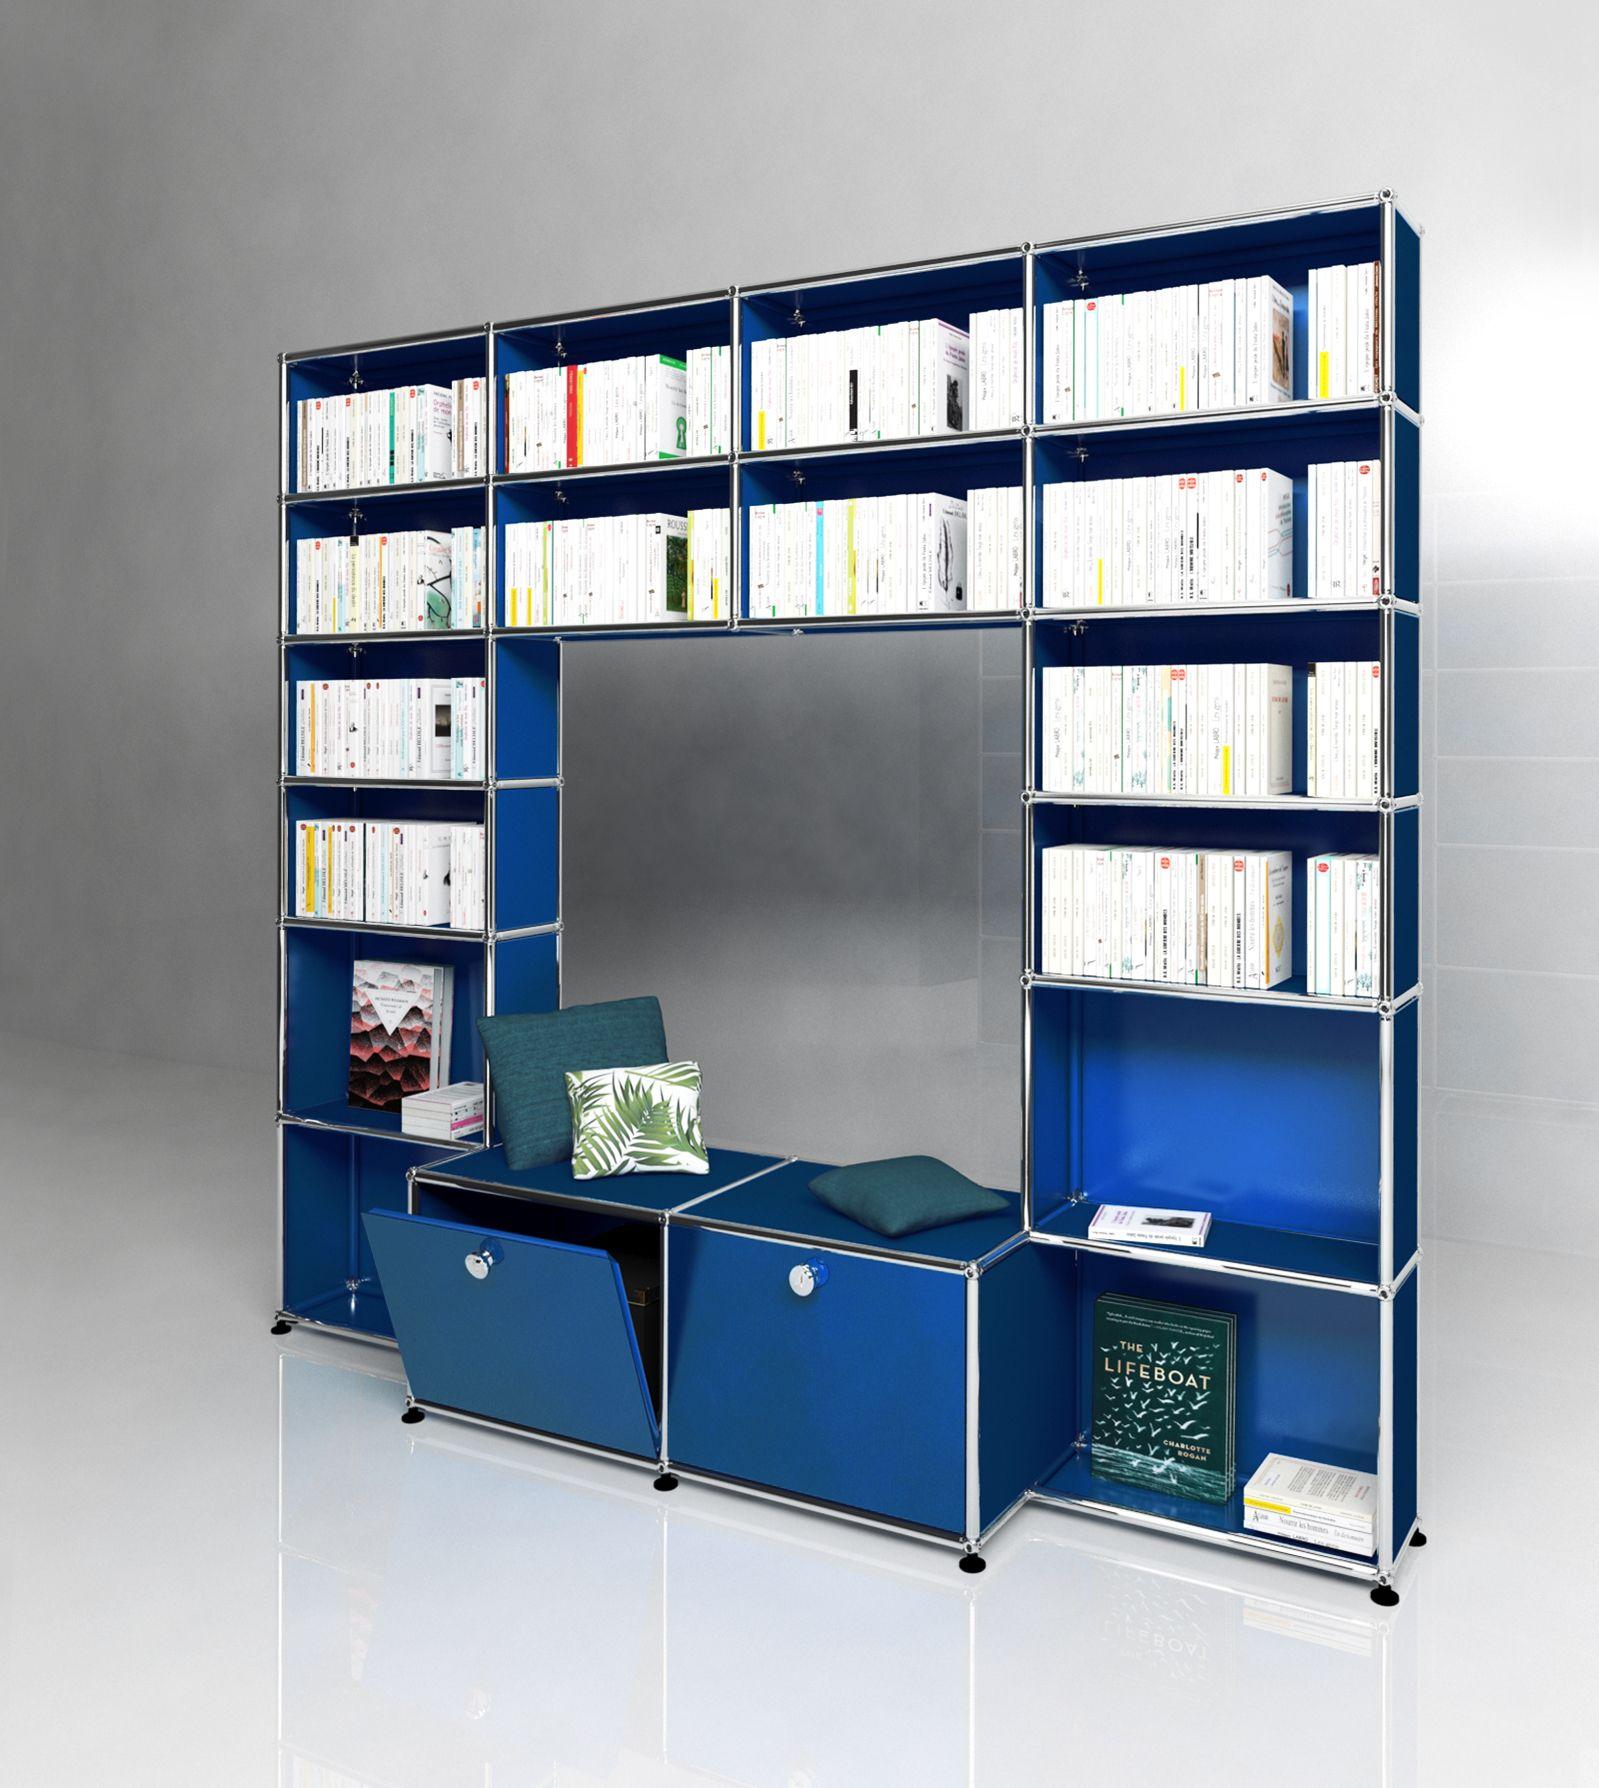 Grande Biblioth Que Usm Haller Avec Deux Portes Abattantes  # Grande Bibliotheque Avec Porte Coulissante